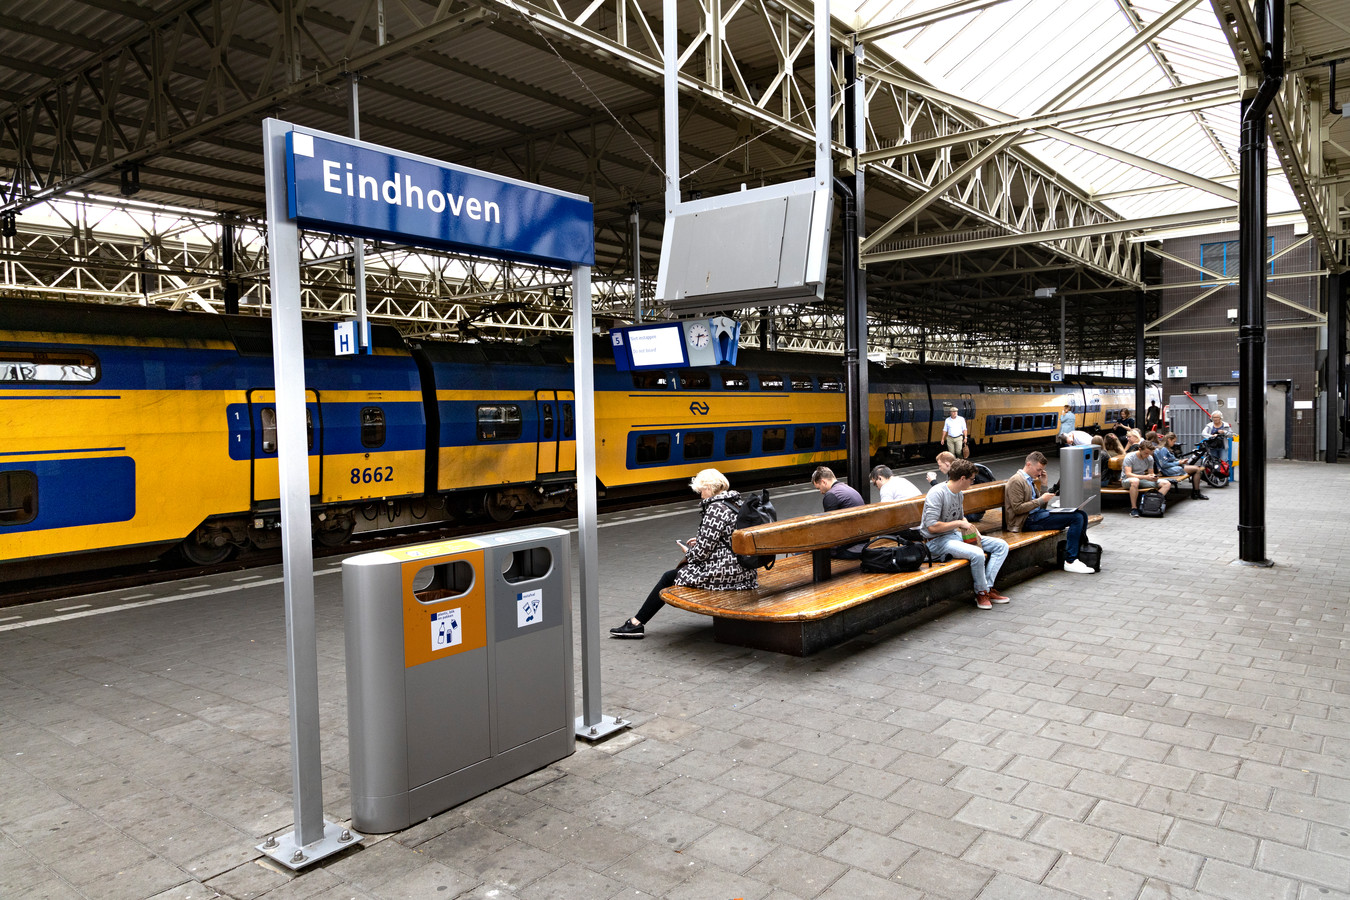 Station Eindhoven.